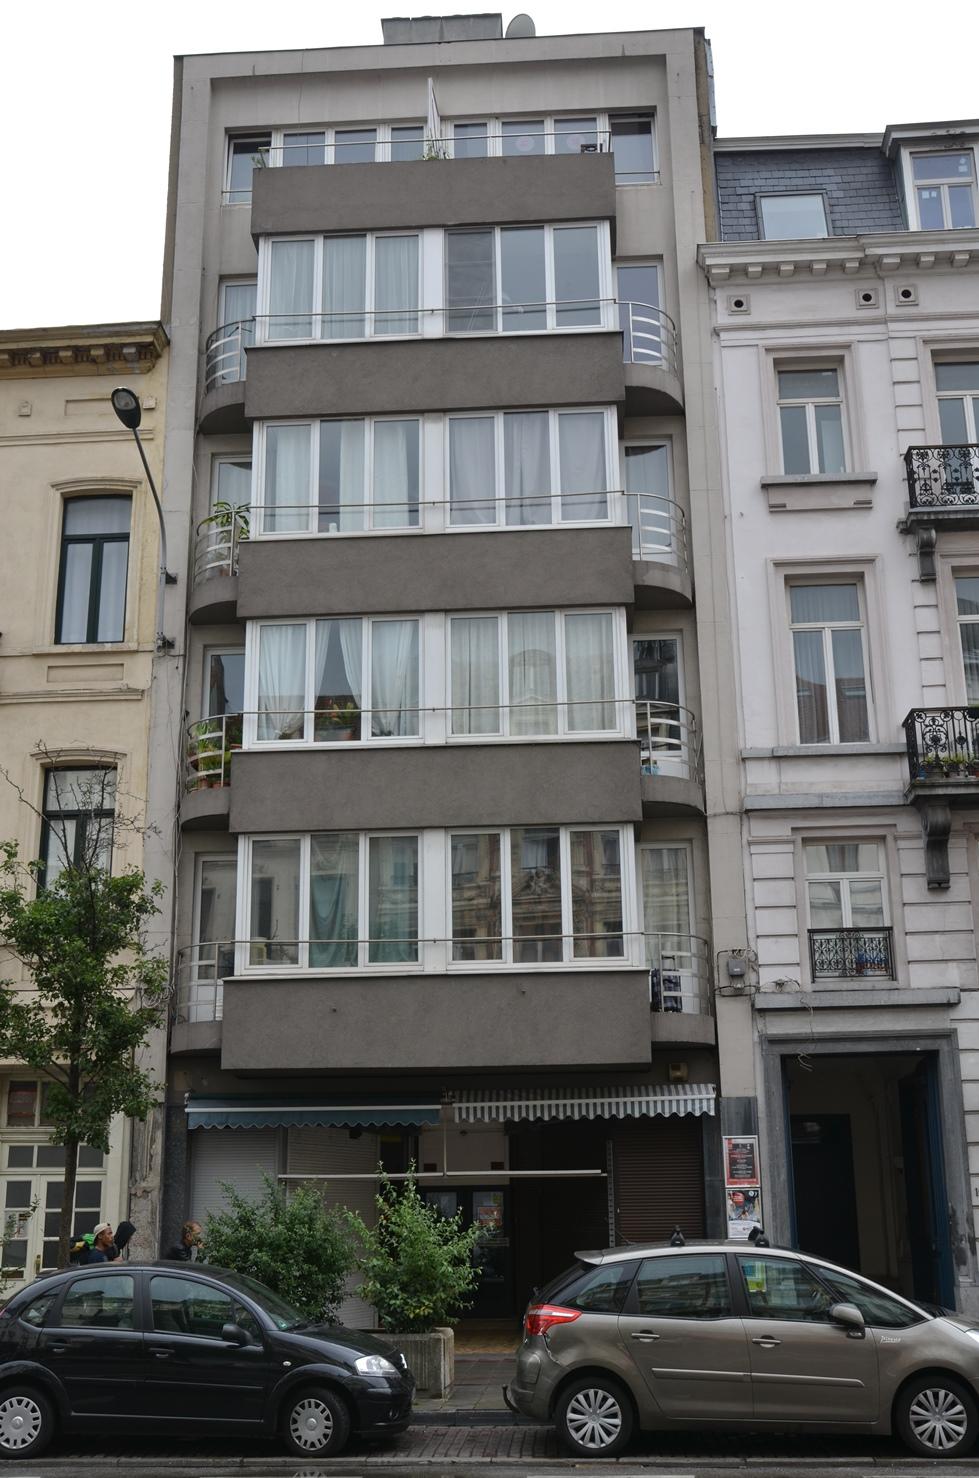 Boulevard Maurice Lemonnier 102-104, 2015